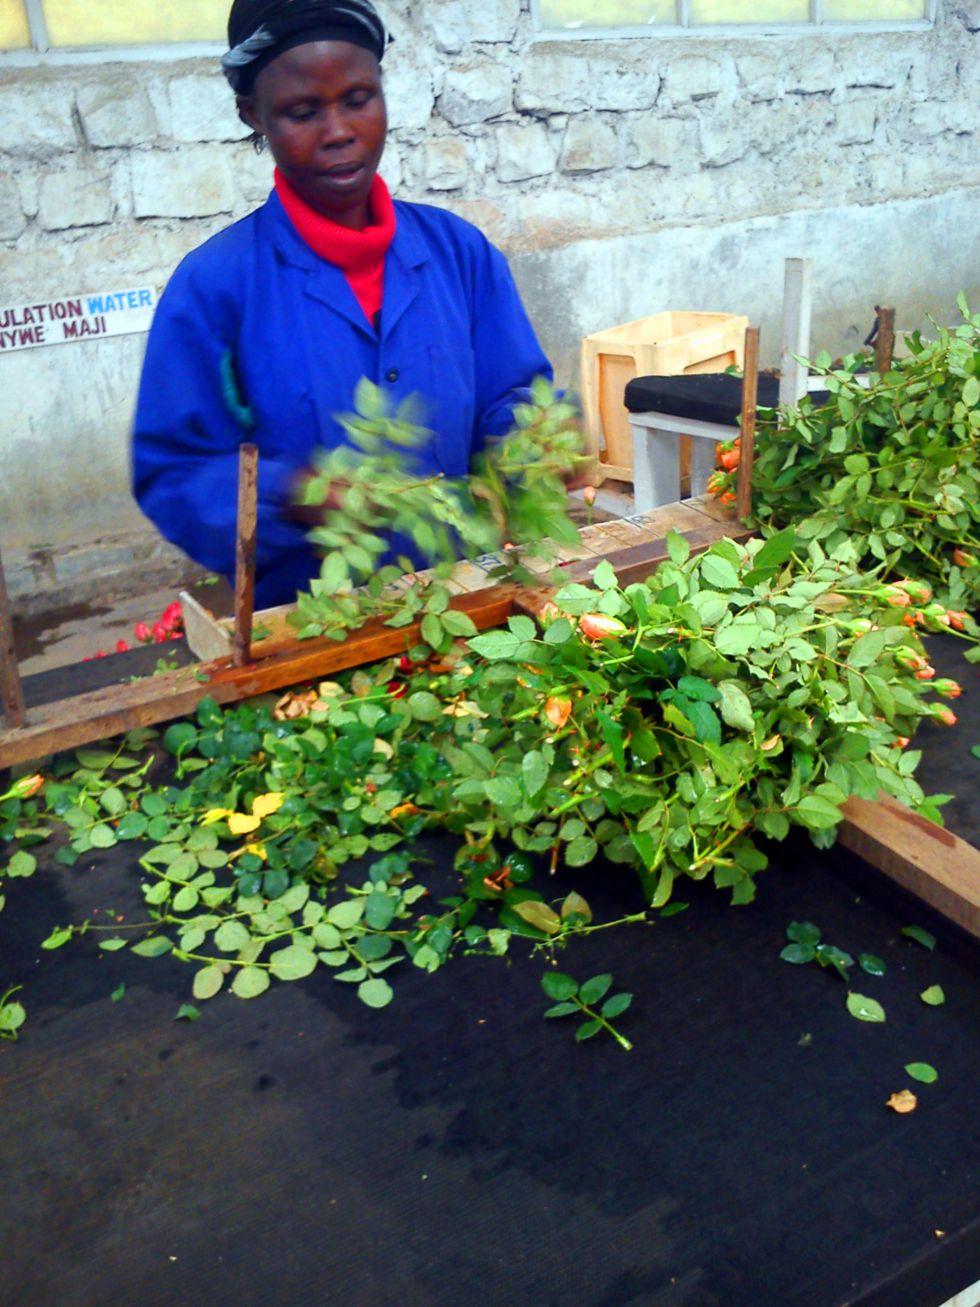 Producción de flores para Europa: Kenia, Etiopía... Dubai... y falta de alimentos 1391800437_893339_1391801069_album_normal